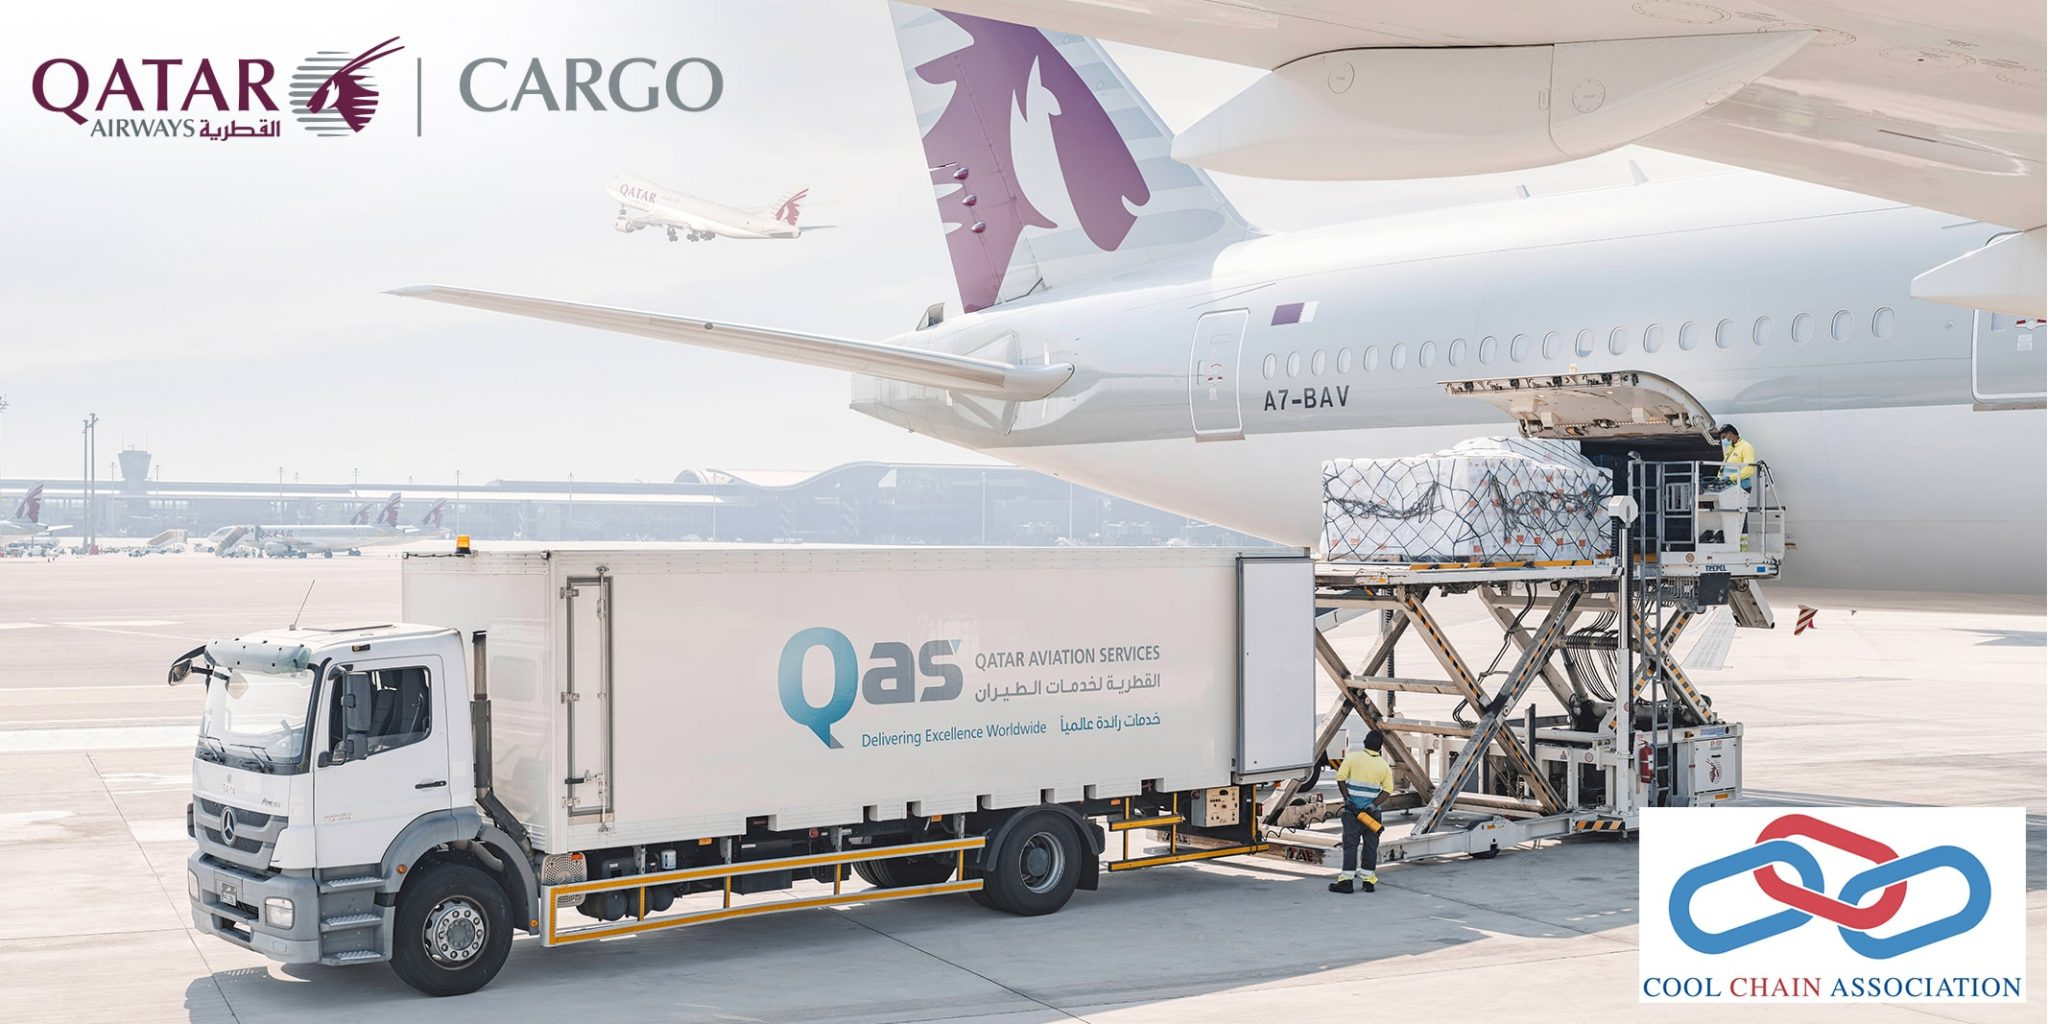 Qatar Airways Cargo becomes Cool Chain Association member